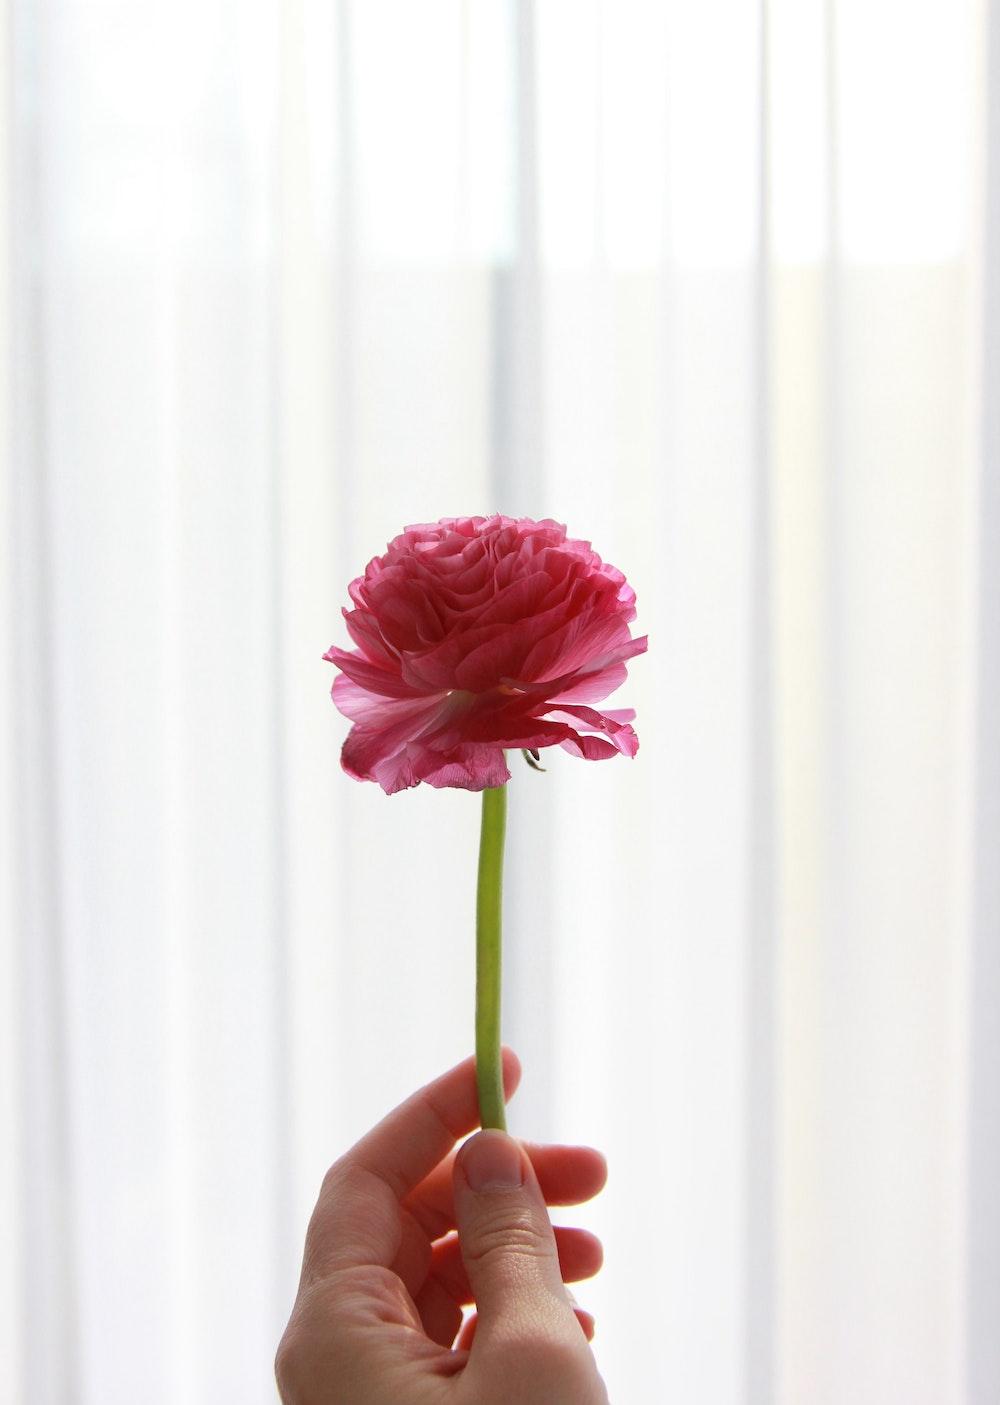 Hand holding 1 pink carnation